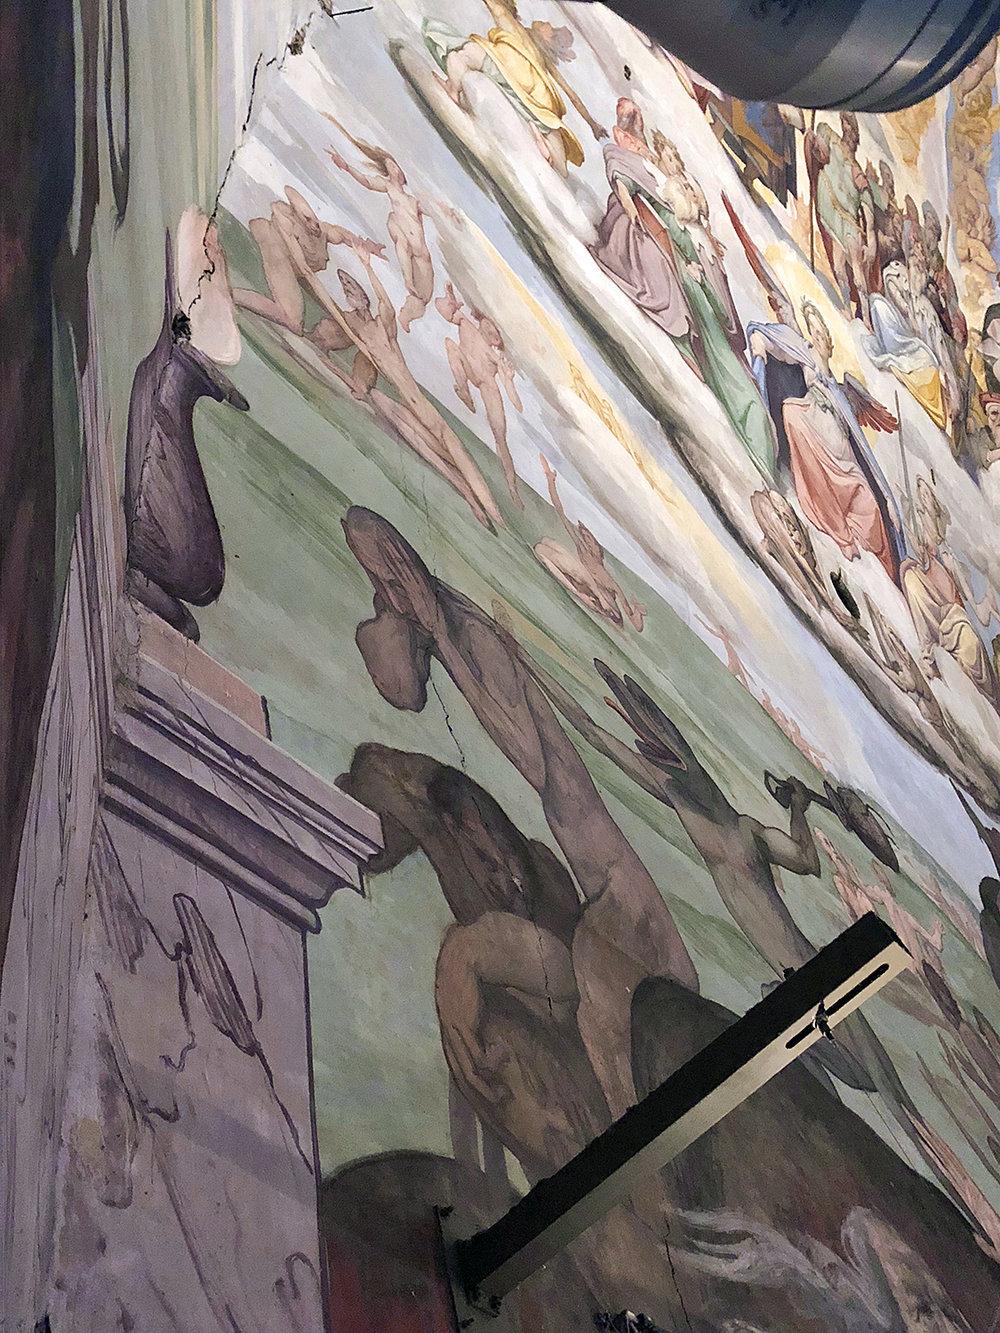 2018 ITALY_firenze_duomo ceiling.jpg